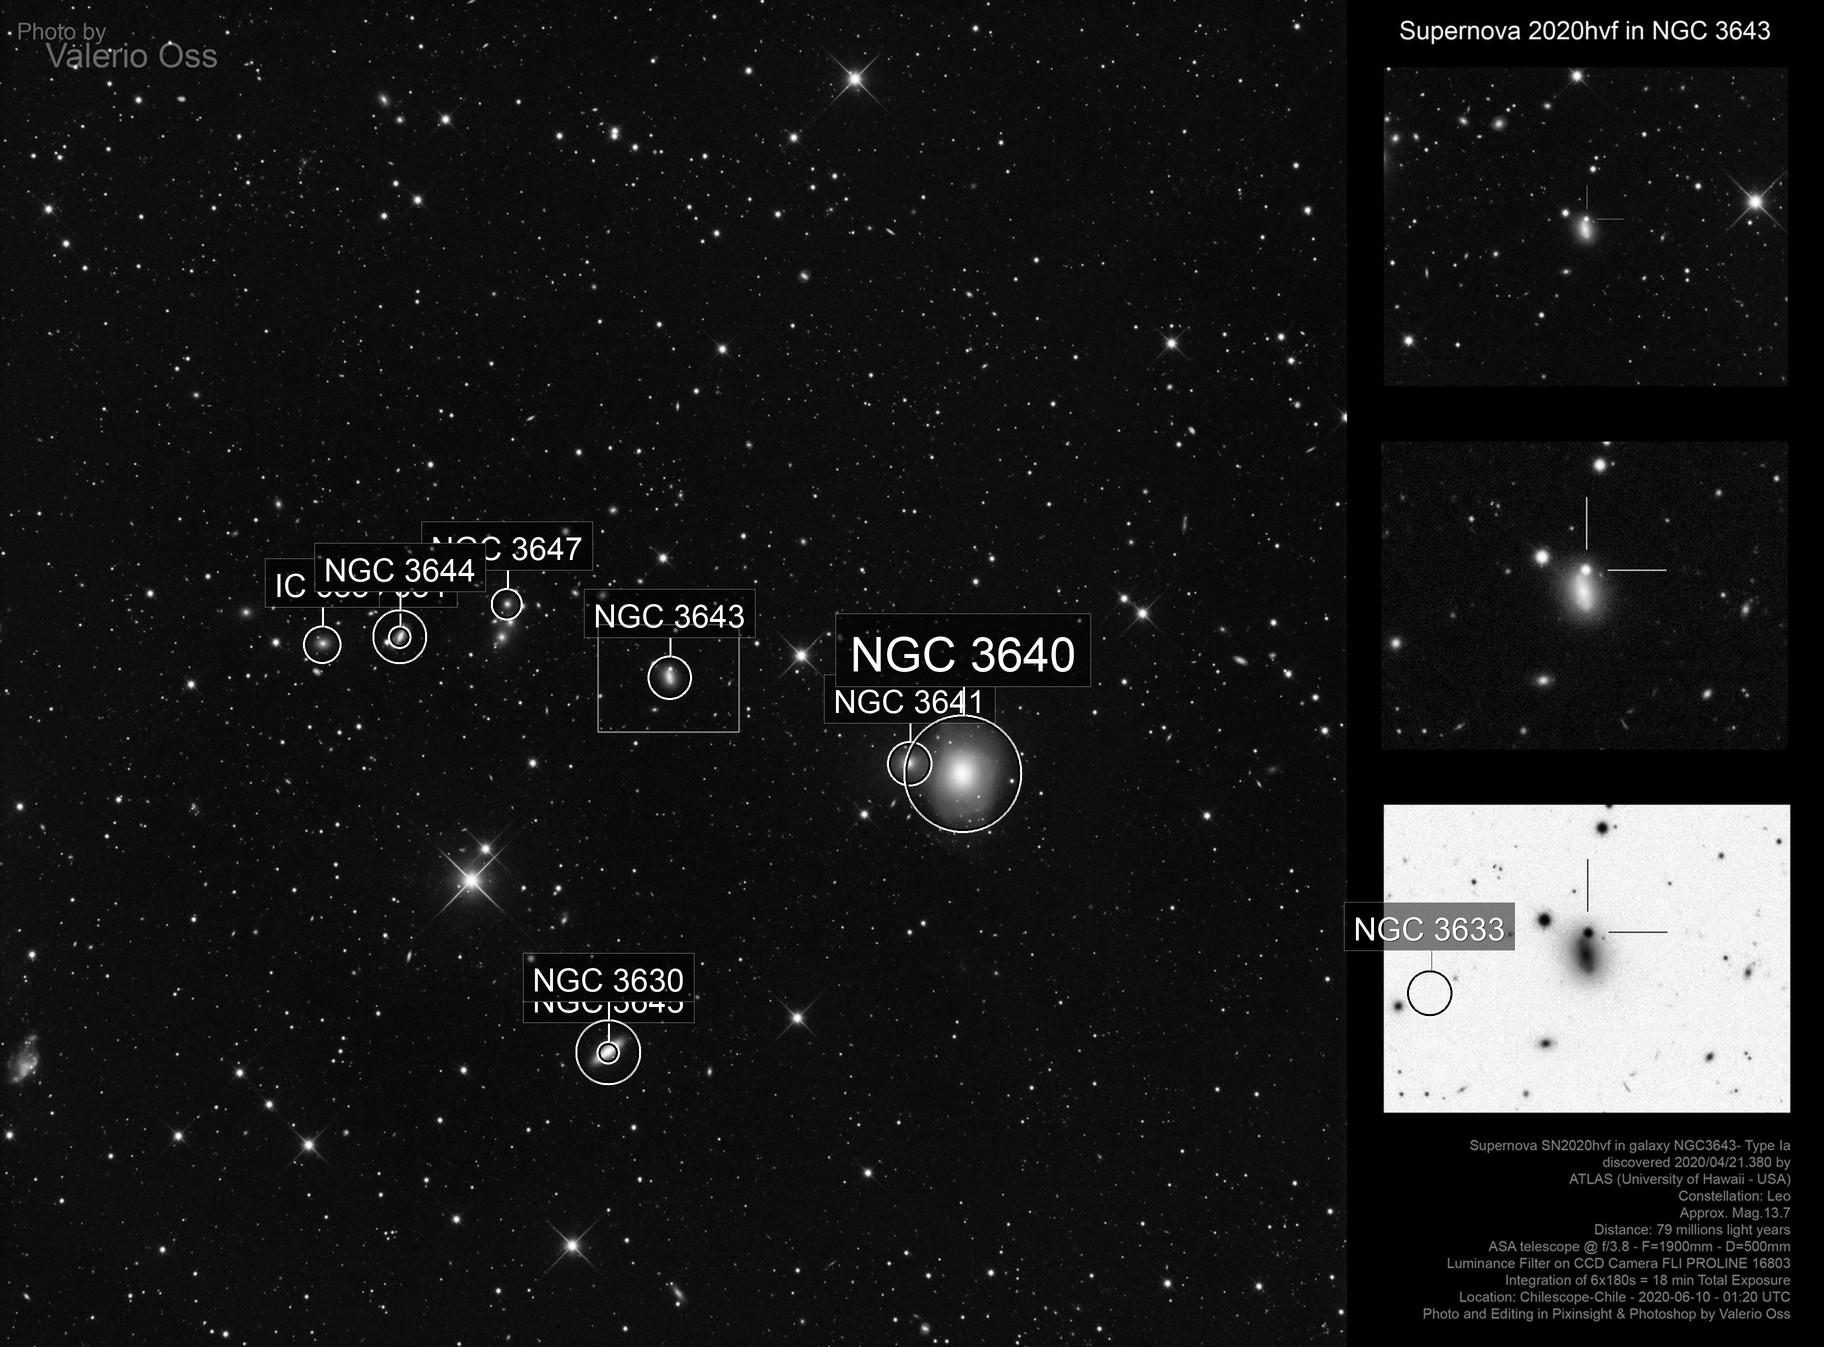 Supernova SN2020hvf in galaxy NGC3643